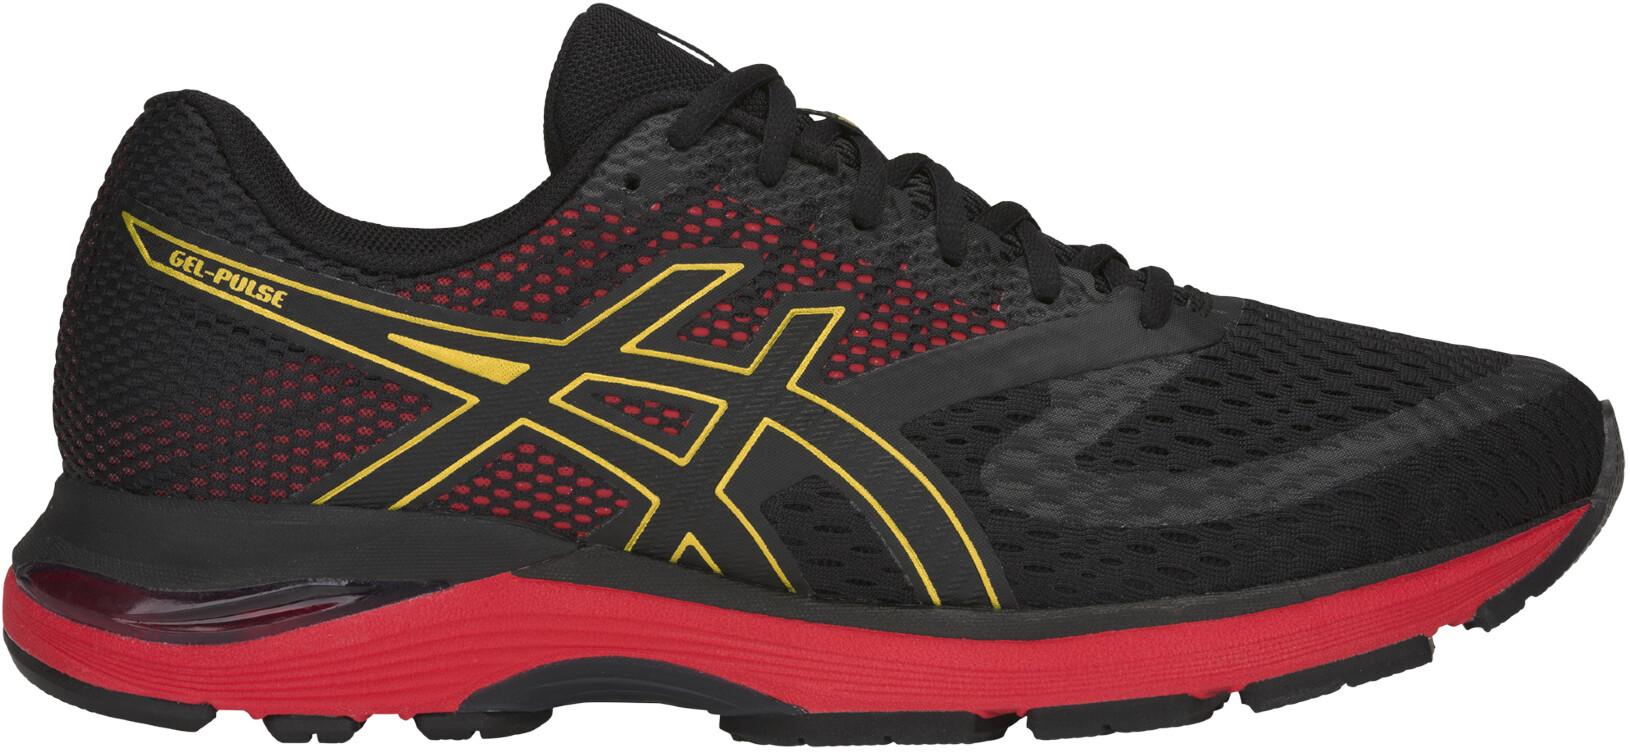 detailed look 6a3f0 f75ff asics Gel-Pulse 10 - Chaussures running Homme - noir